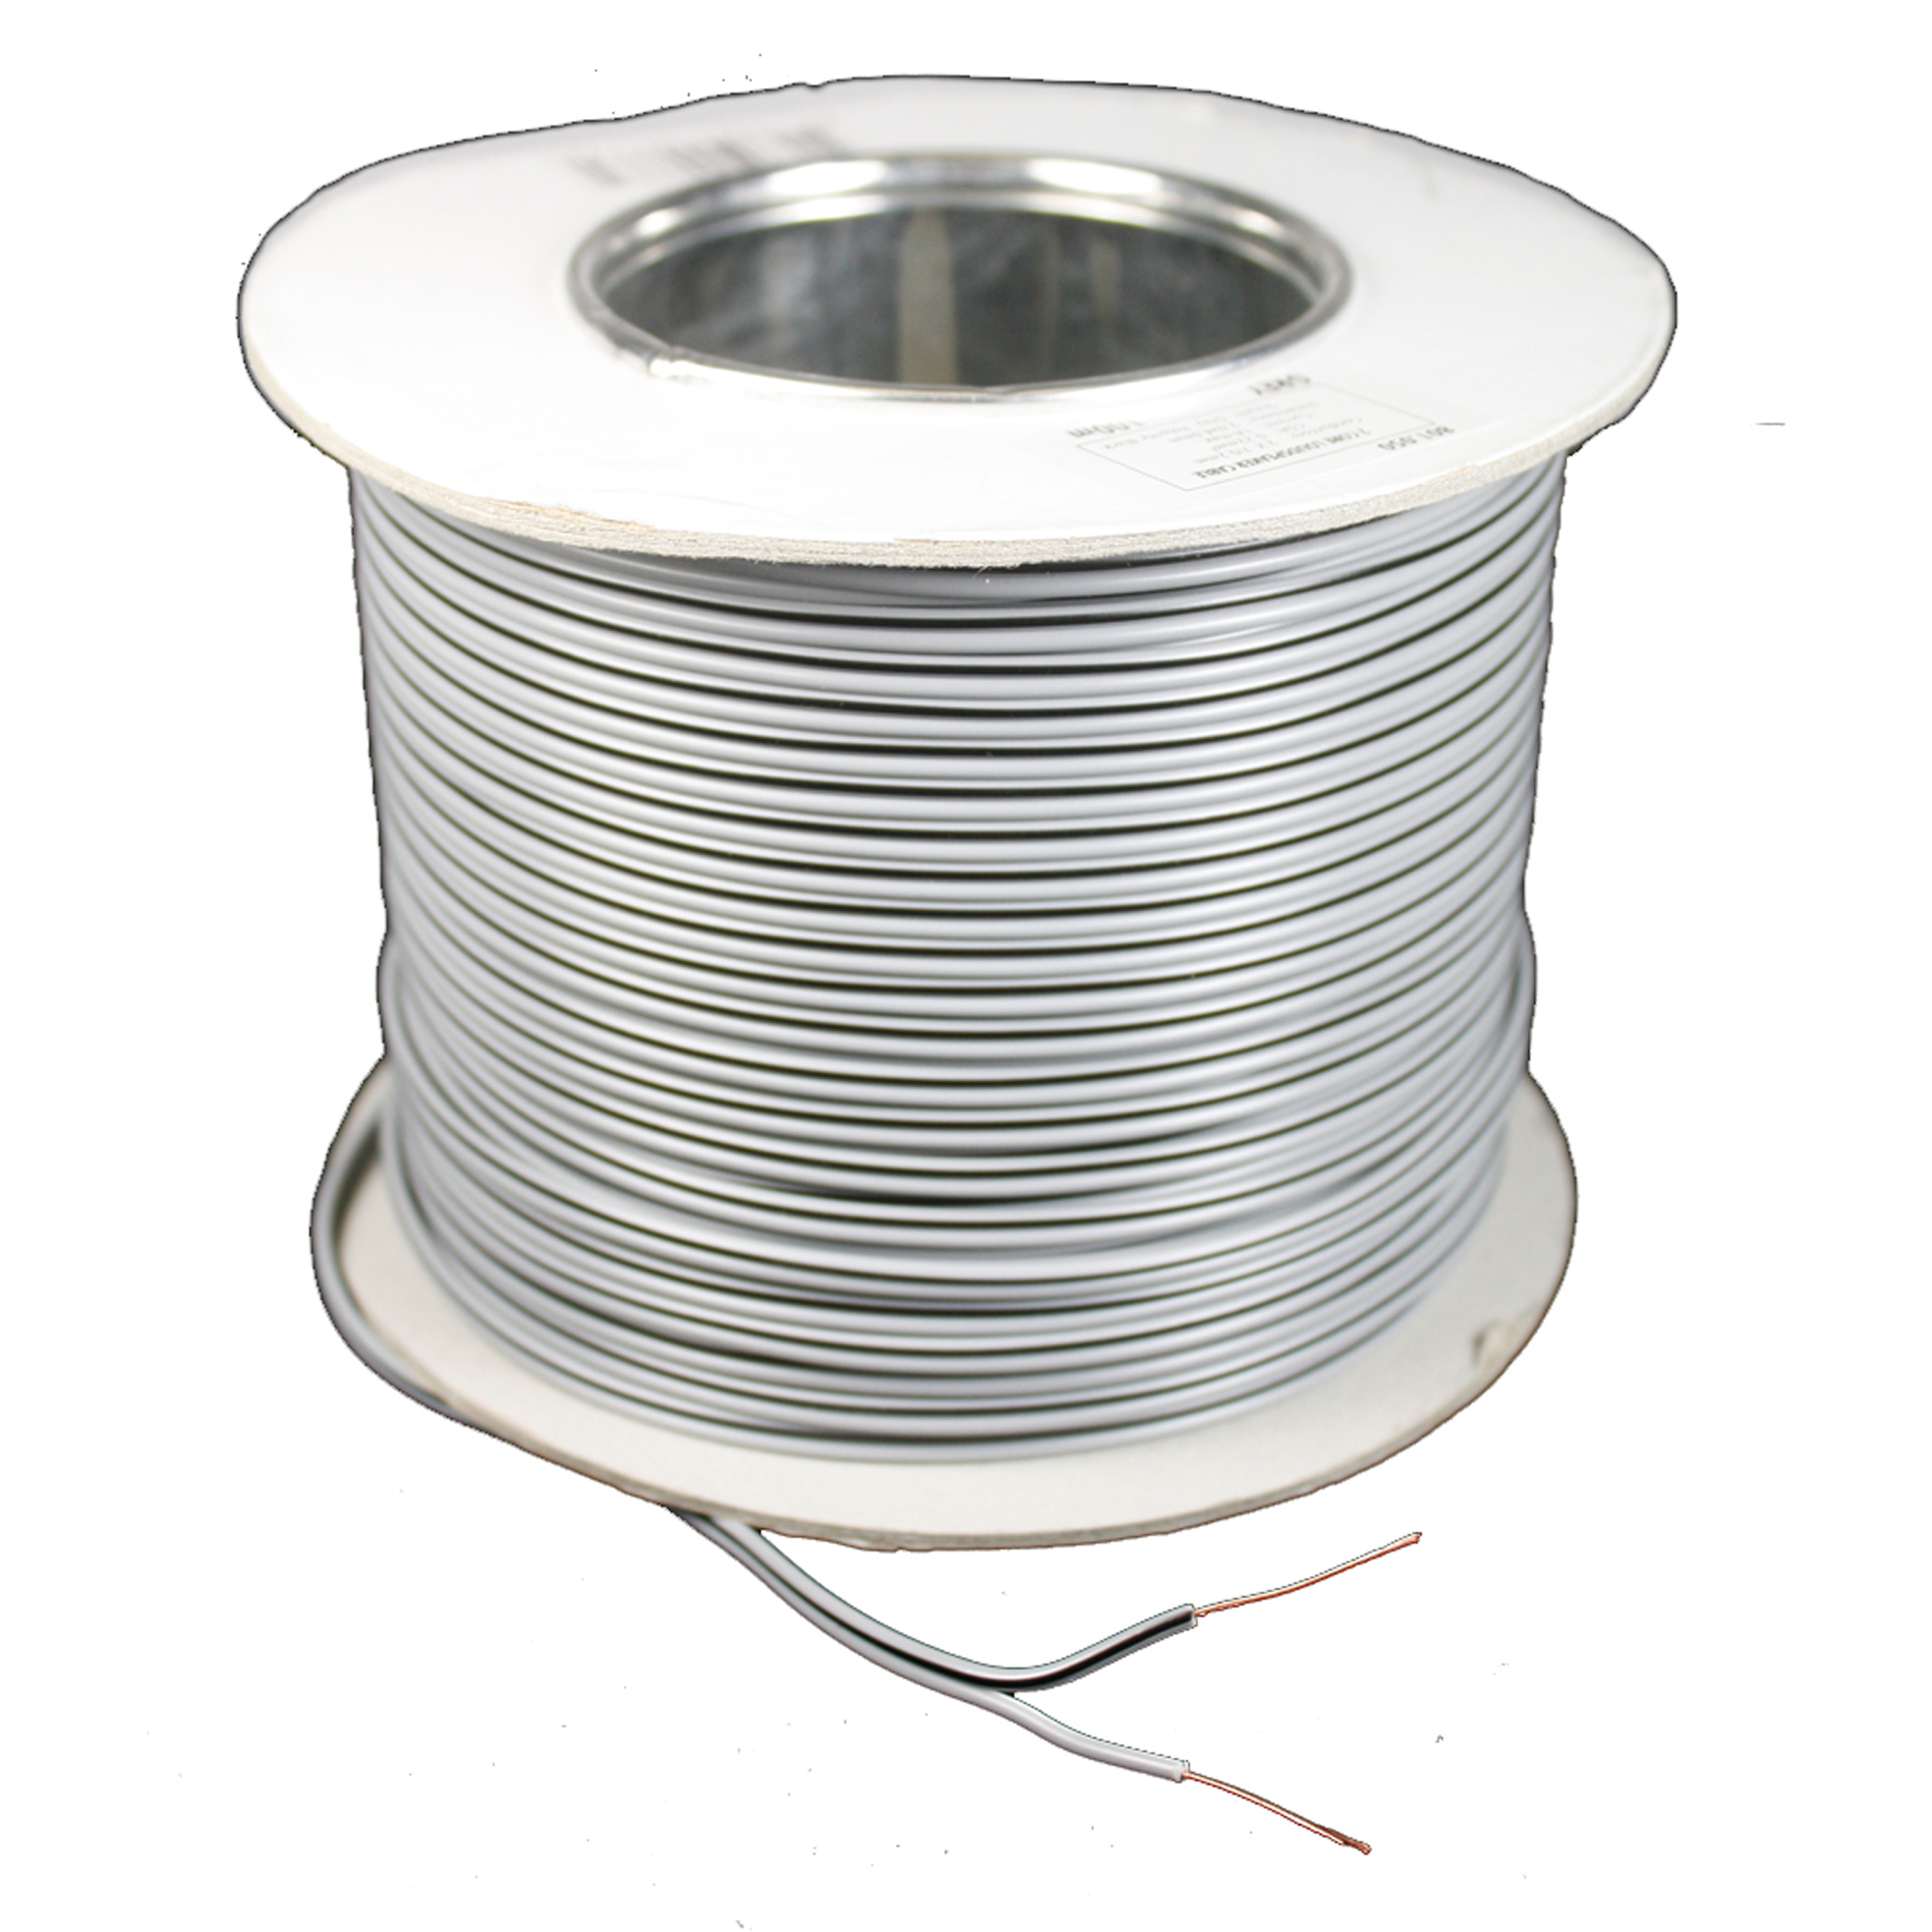 Skytronic 2 Core Figure 8 Speaker Cable Grey 100m